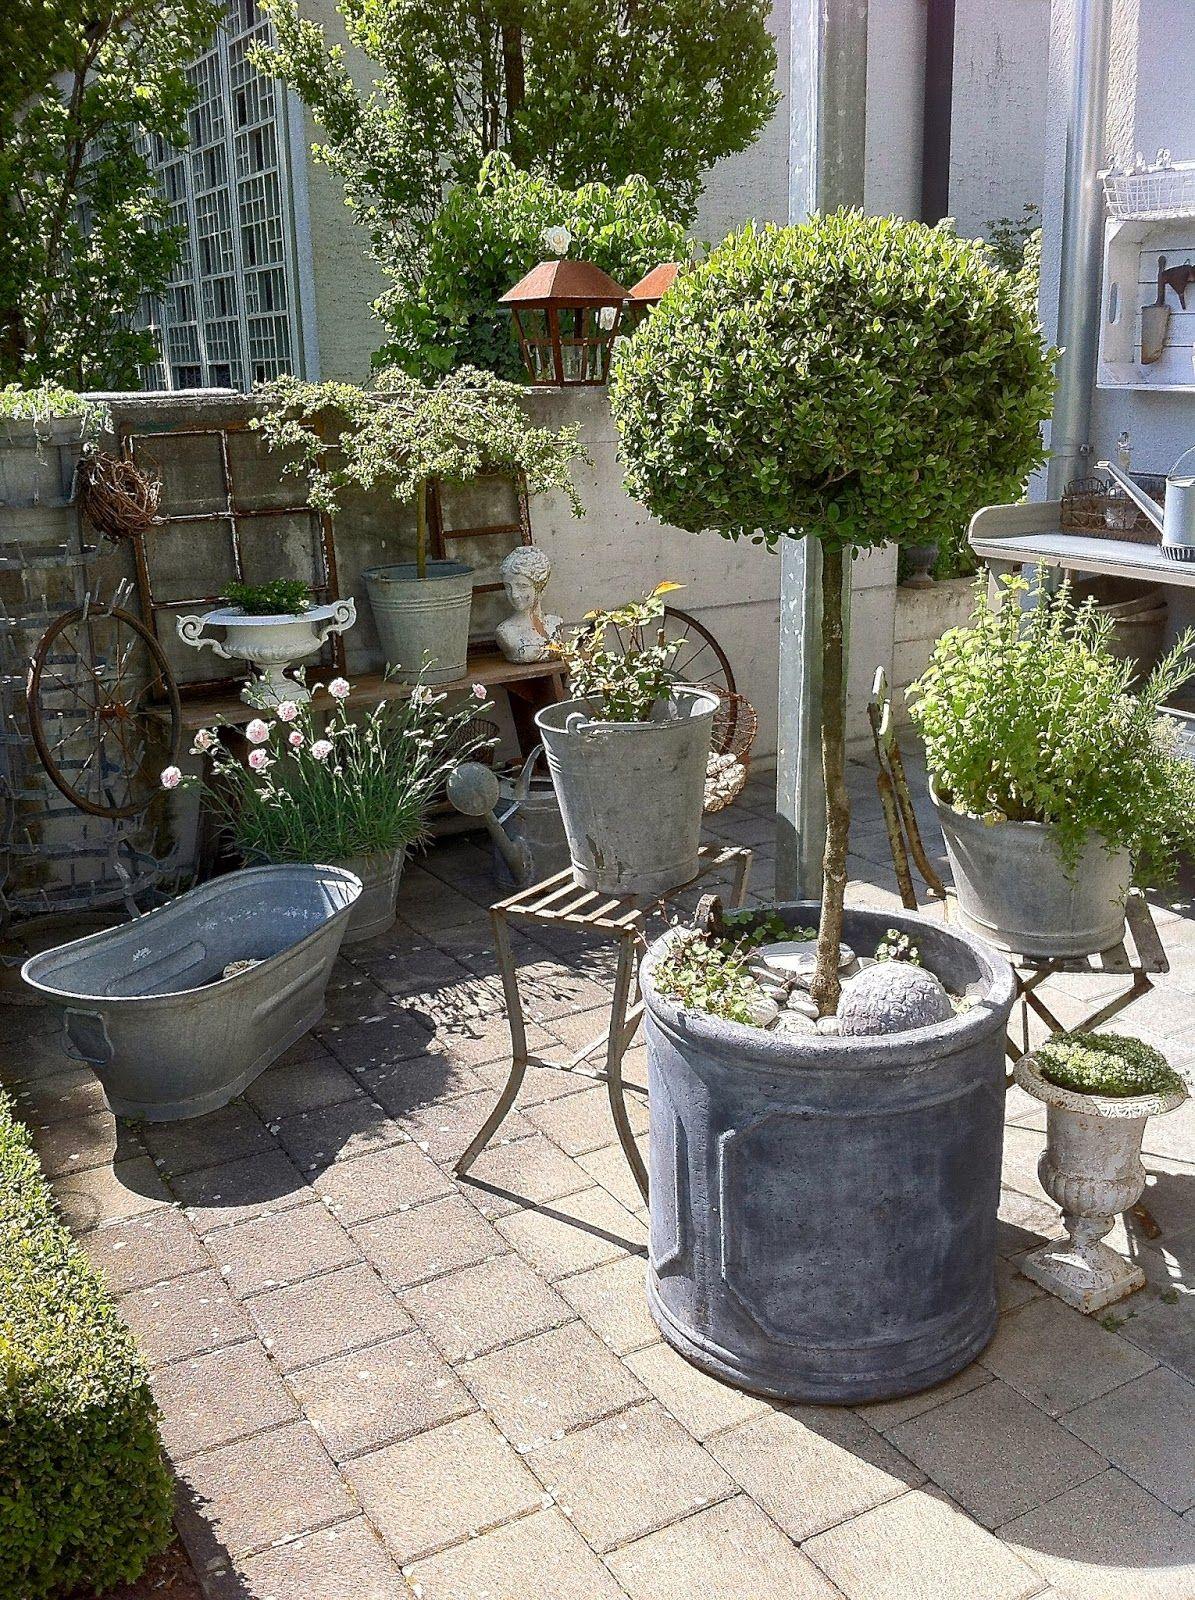 Weisses herz rosengarten blumenk bel und deko f r - Gartengestaltung rosengarten ...